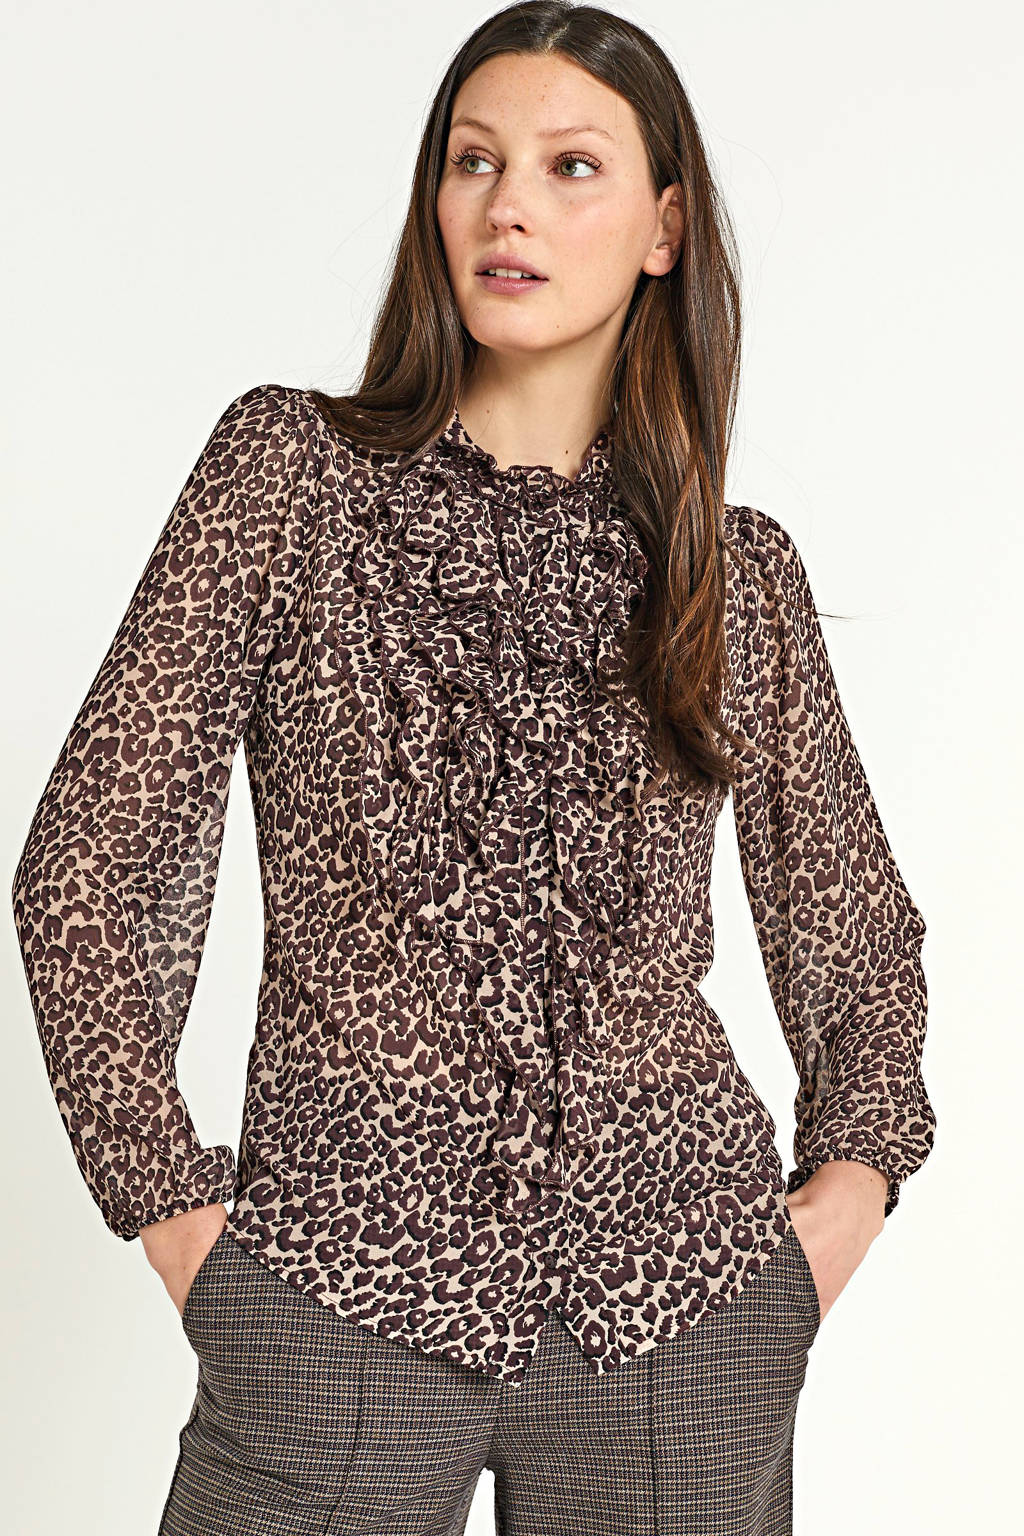 Saint Tropez semi-transparante blouse Lilly met panterprint en ruches taupe/bruin, Taupe/bruin